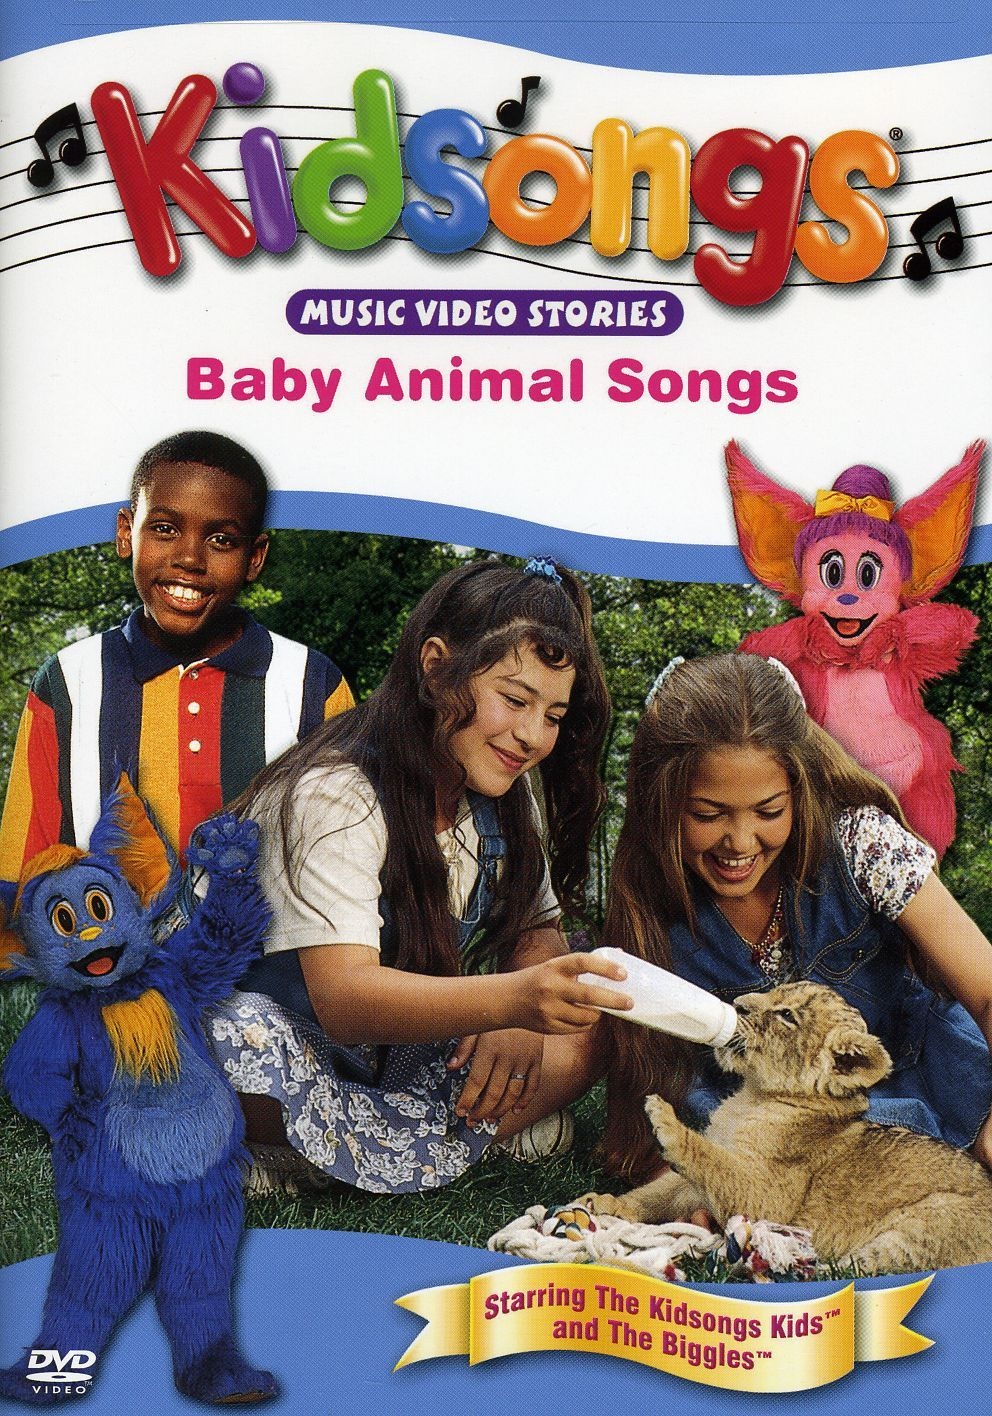 Kidsongs: Baby Animal Songs | Kidsongs | Pinterest | Baby animals ...